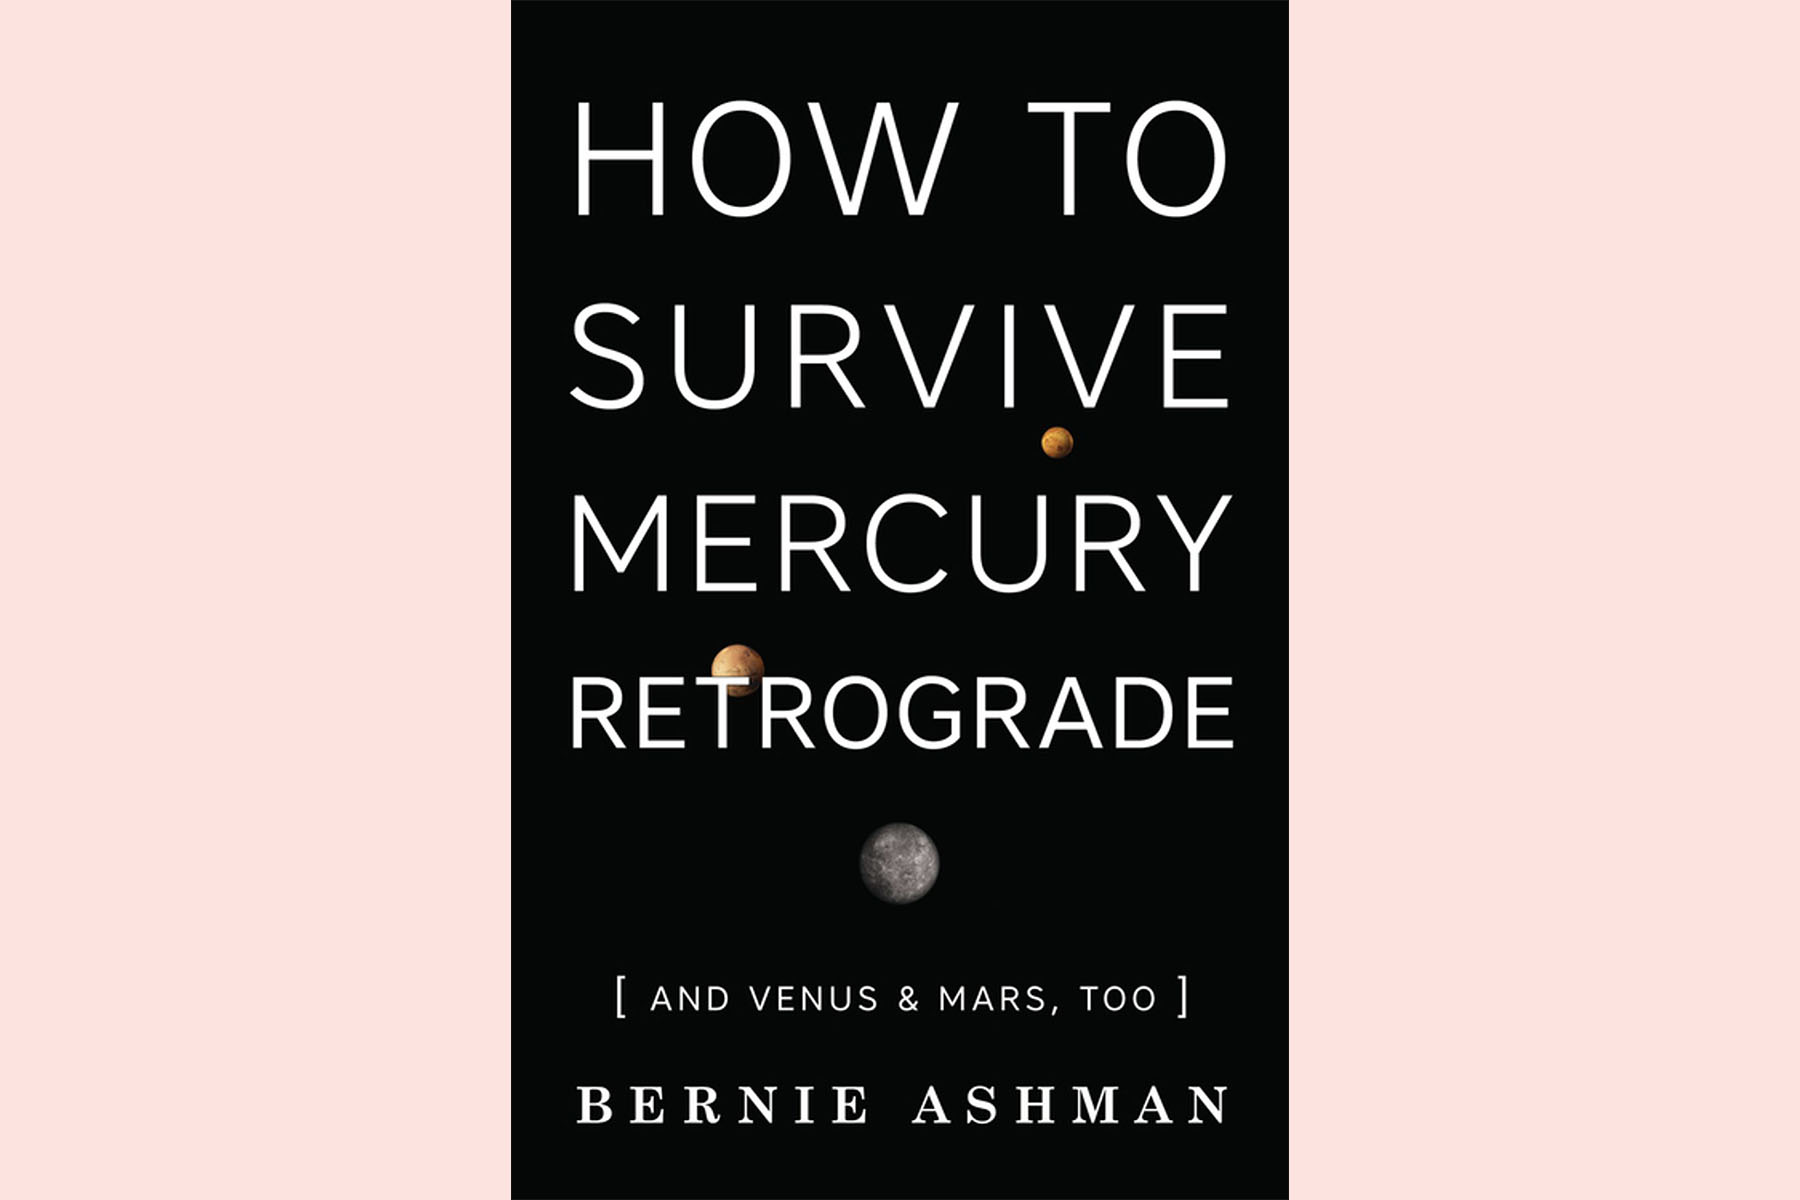 how to survive mercury retrograde book